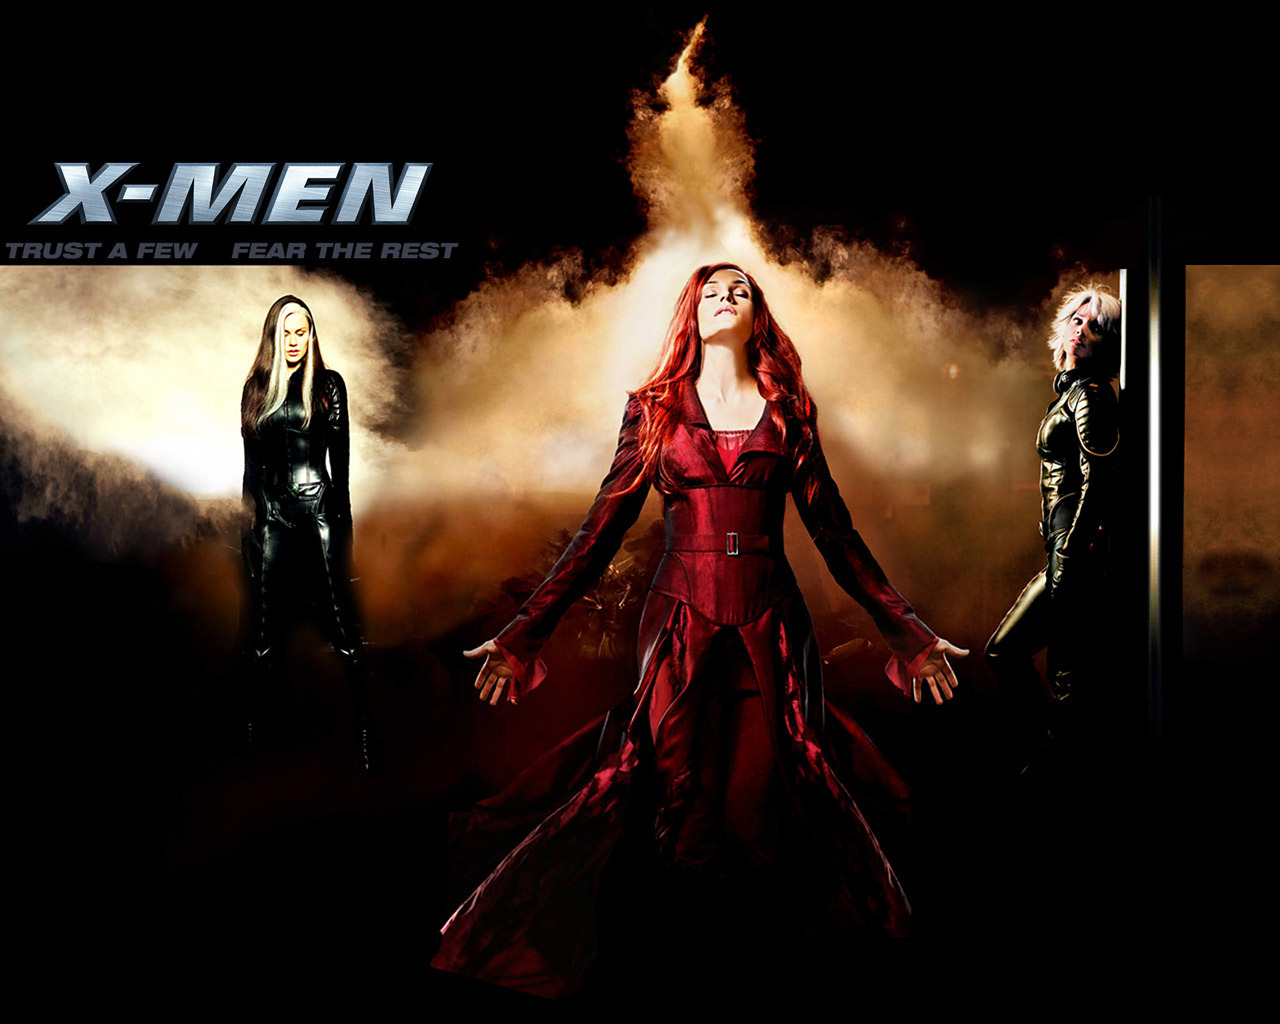 X3 Ladies   X men THE MOVIE Wallpaper 19274168 1280x1024